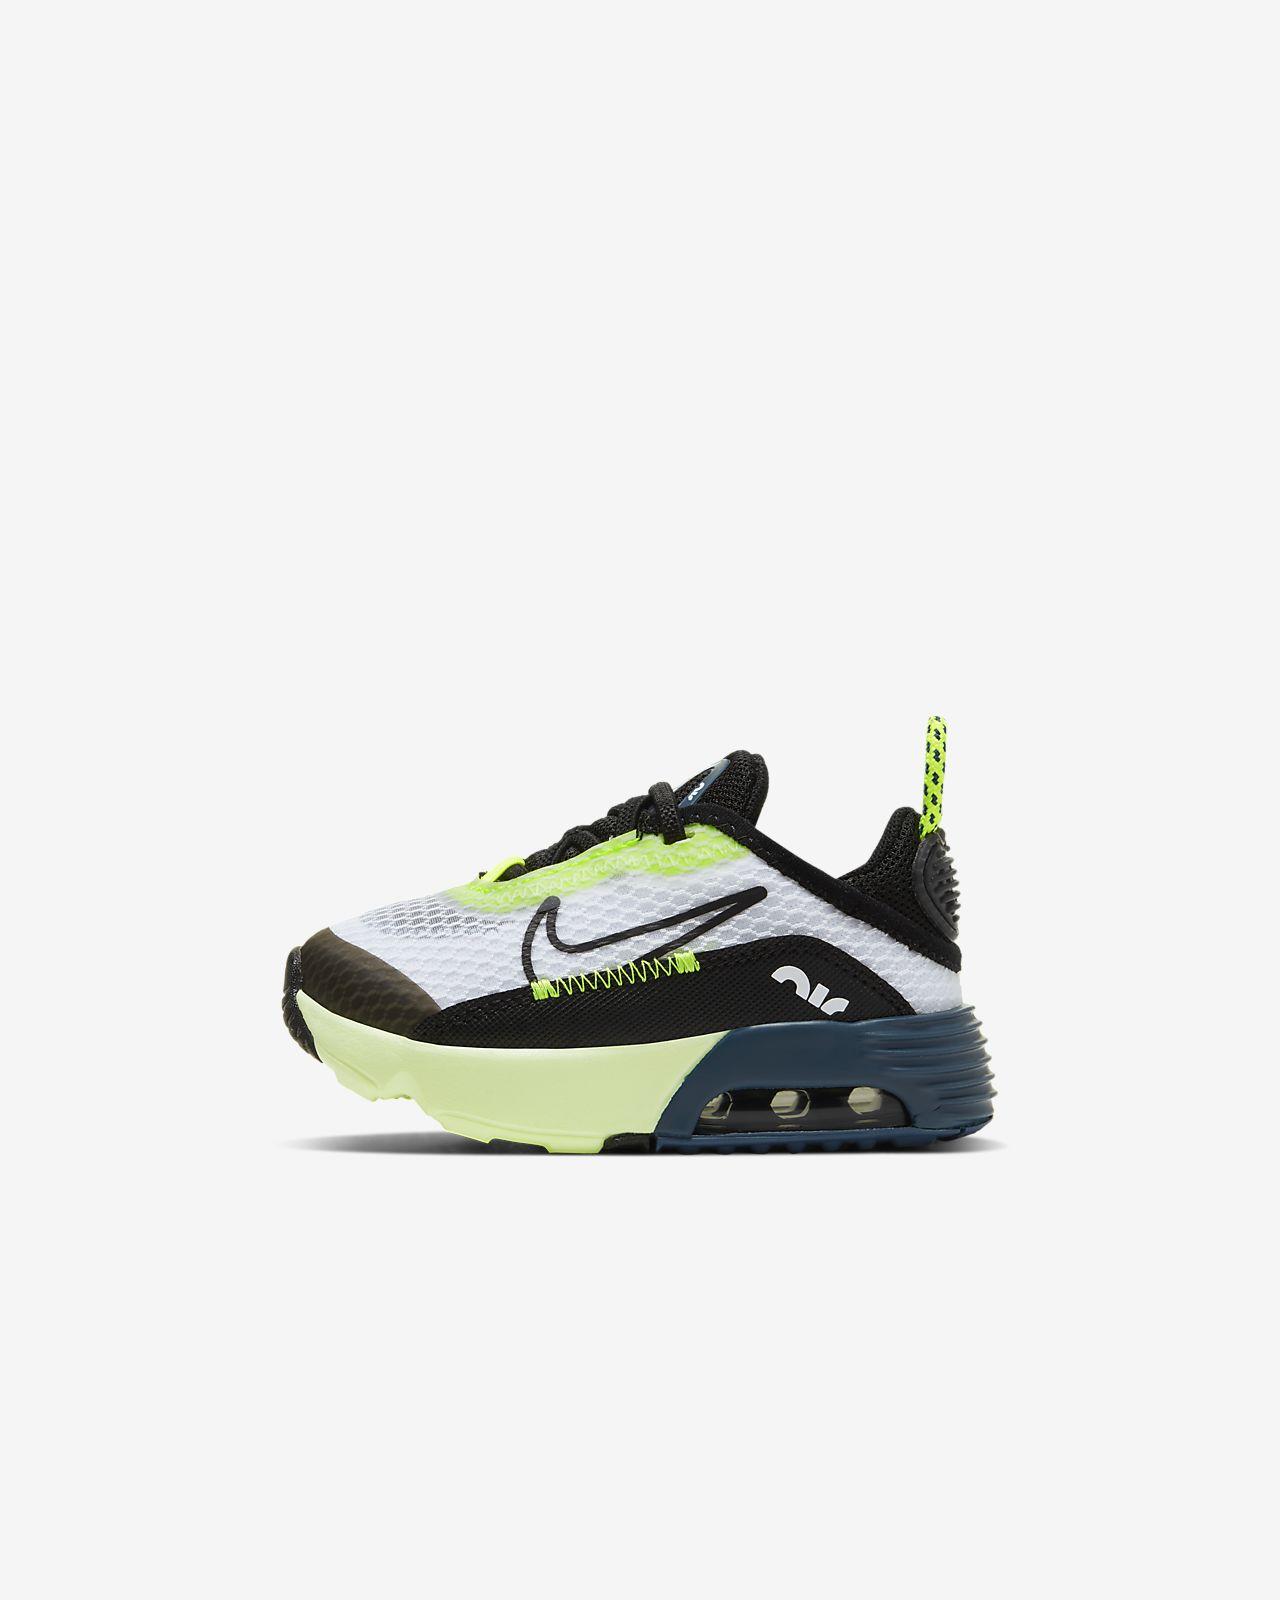 Nike Air Max 2090 嬰幼兒鞋款